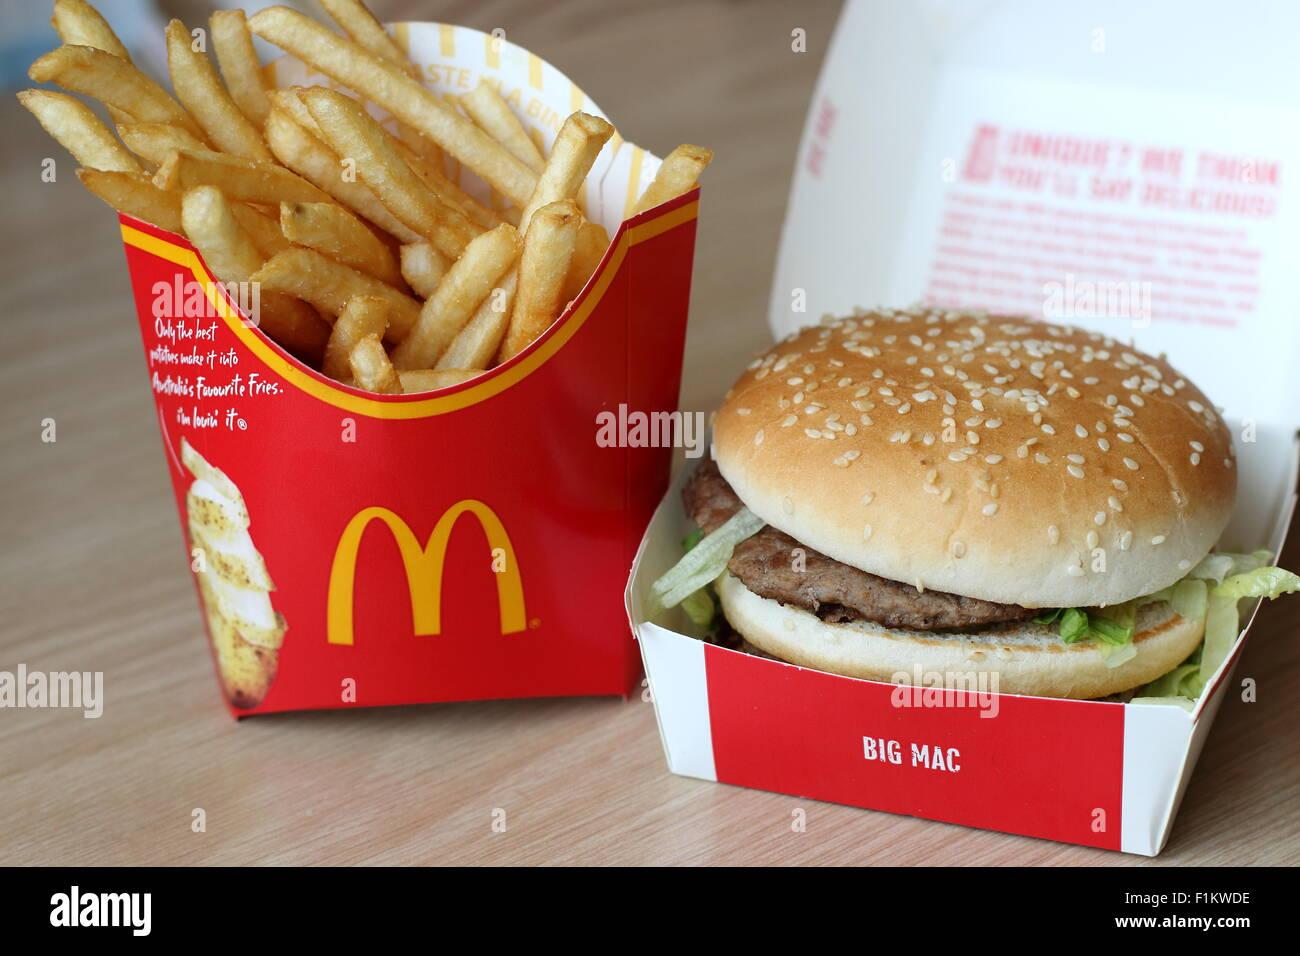 mcdonalds-big-mac-burger-and-fries-F1KWD